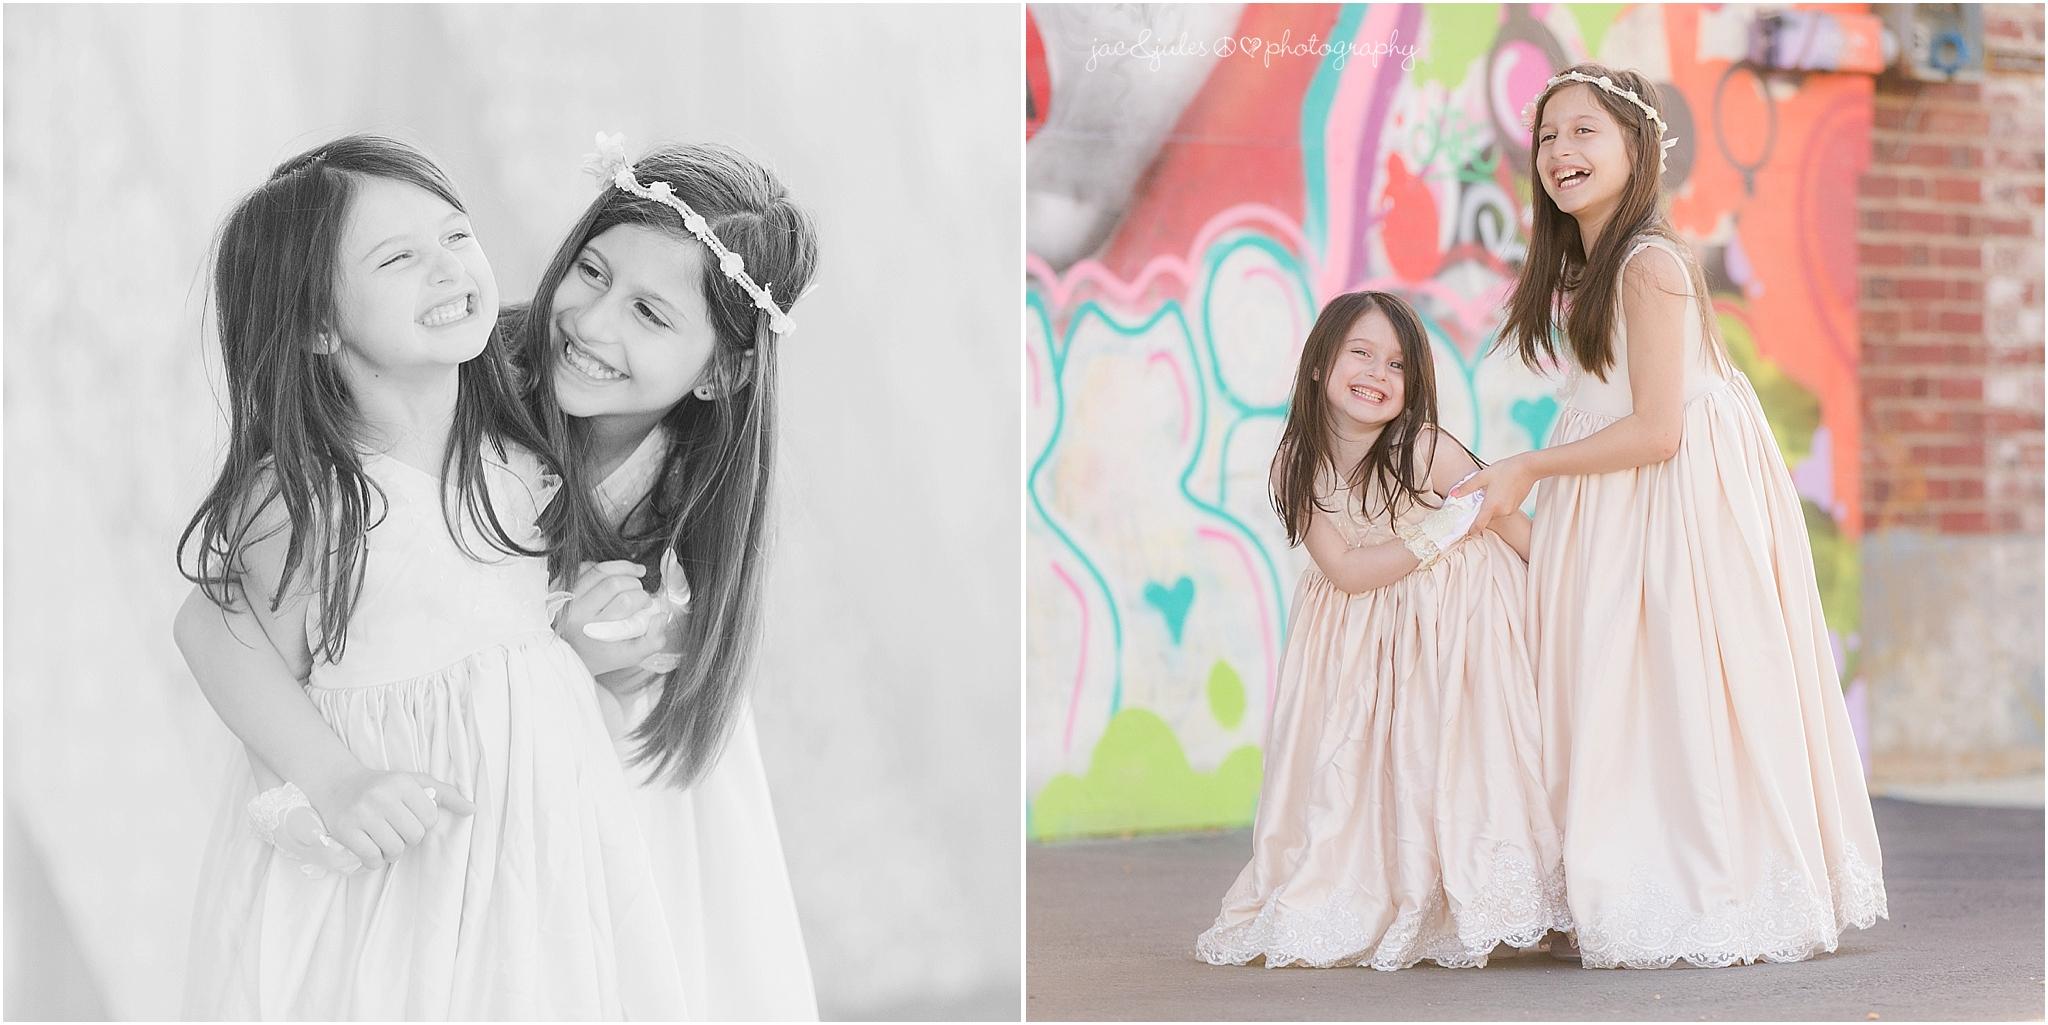 jacnjules photographs girls near graffiti in Asbury Park NJ